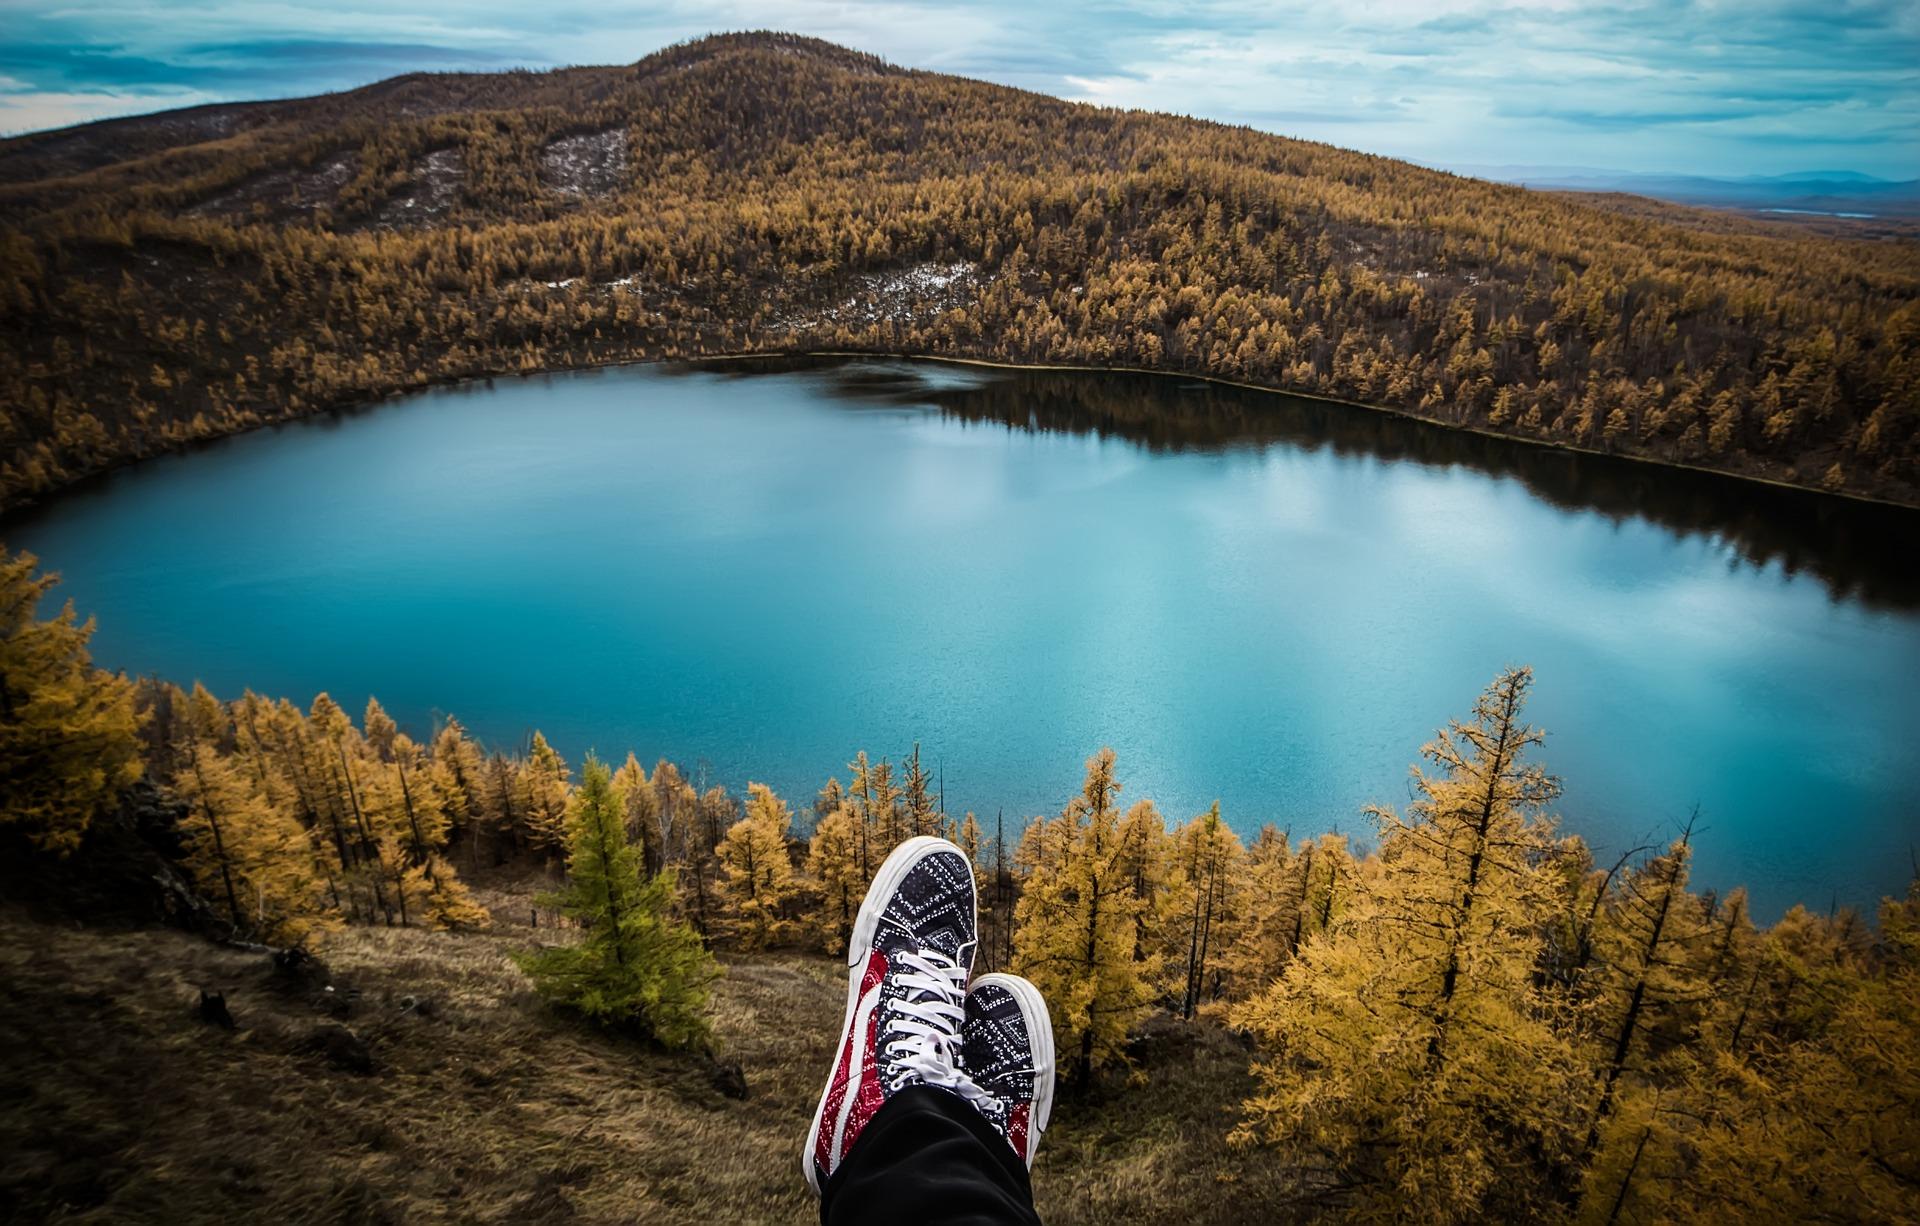 Geoturizmus, a fenntartható utazás